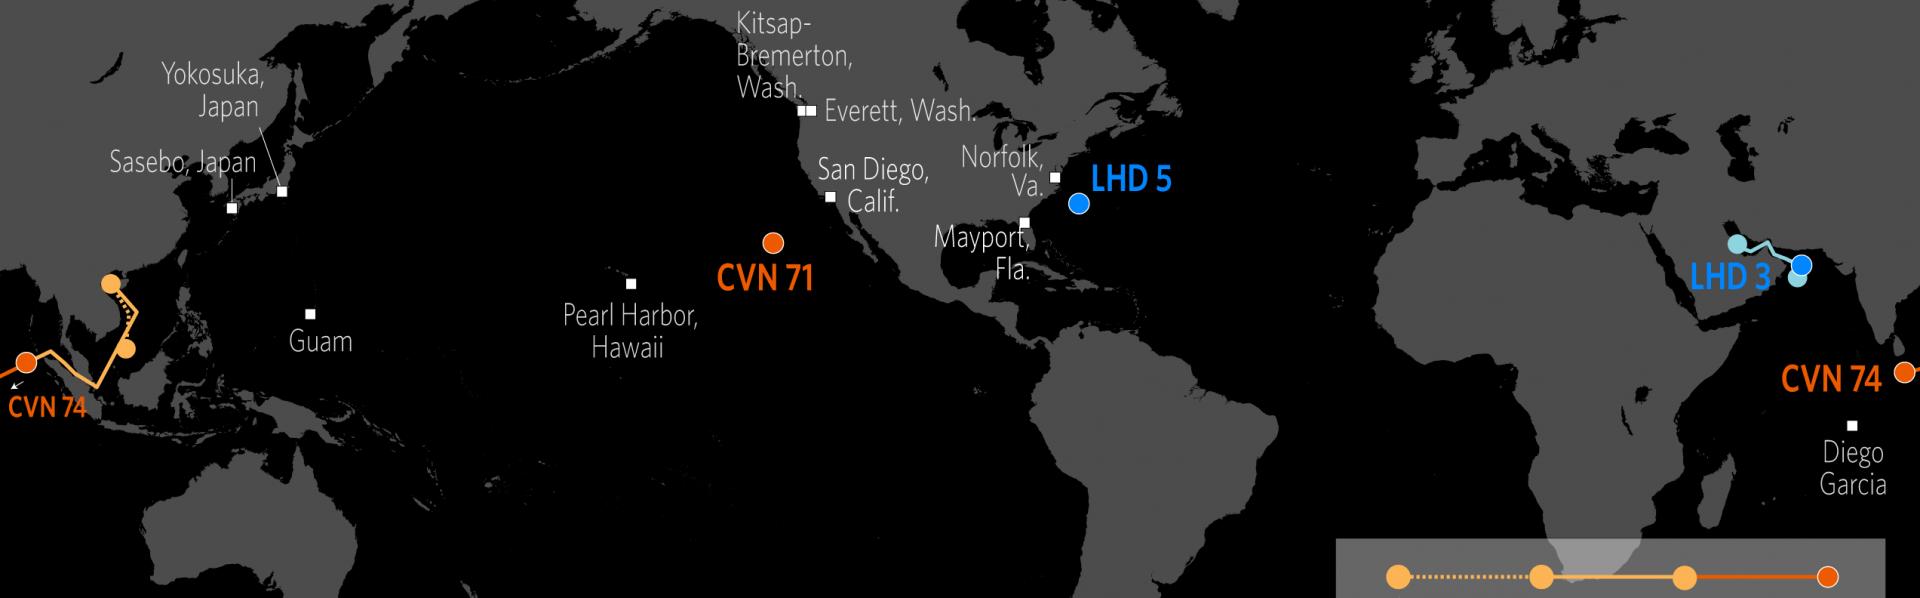 Tracking U.S. Naval Power   Stratfor Worldview